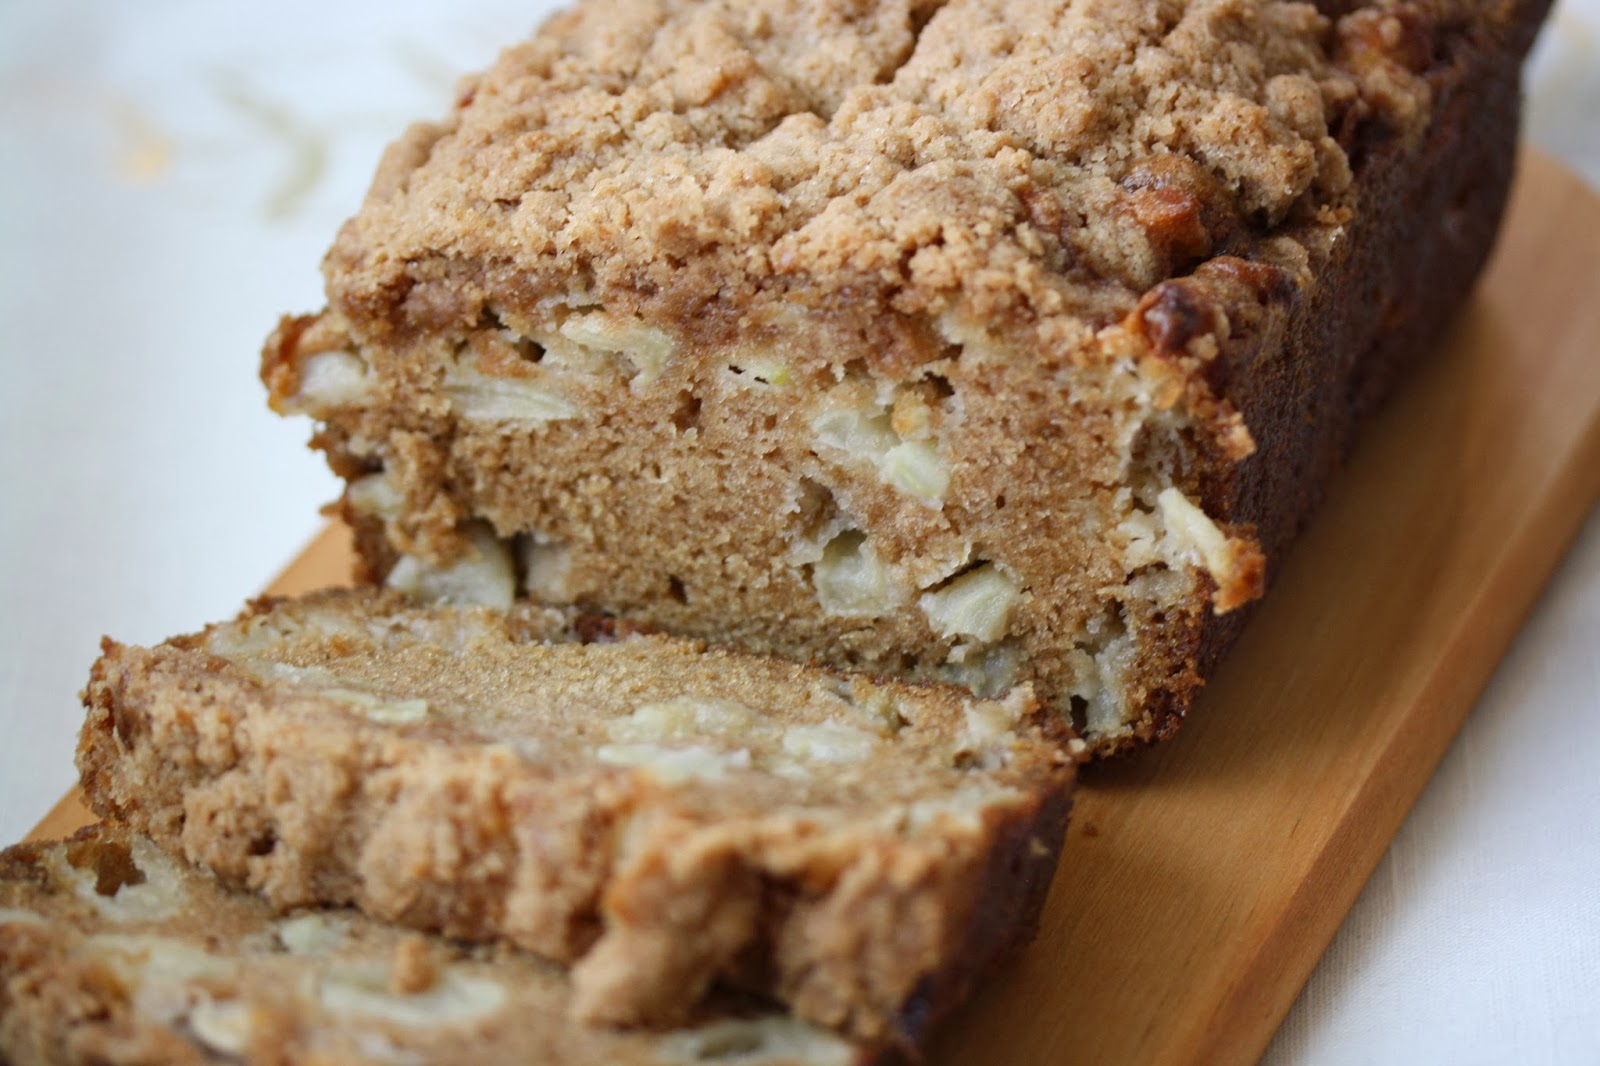 Hot Dinner Happy Home: Apple Cinnamon Bread